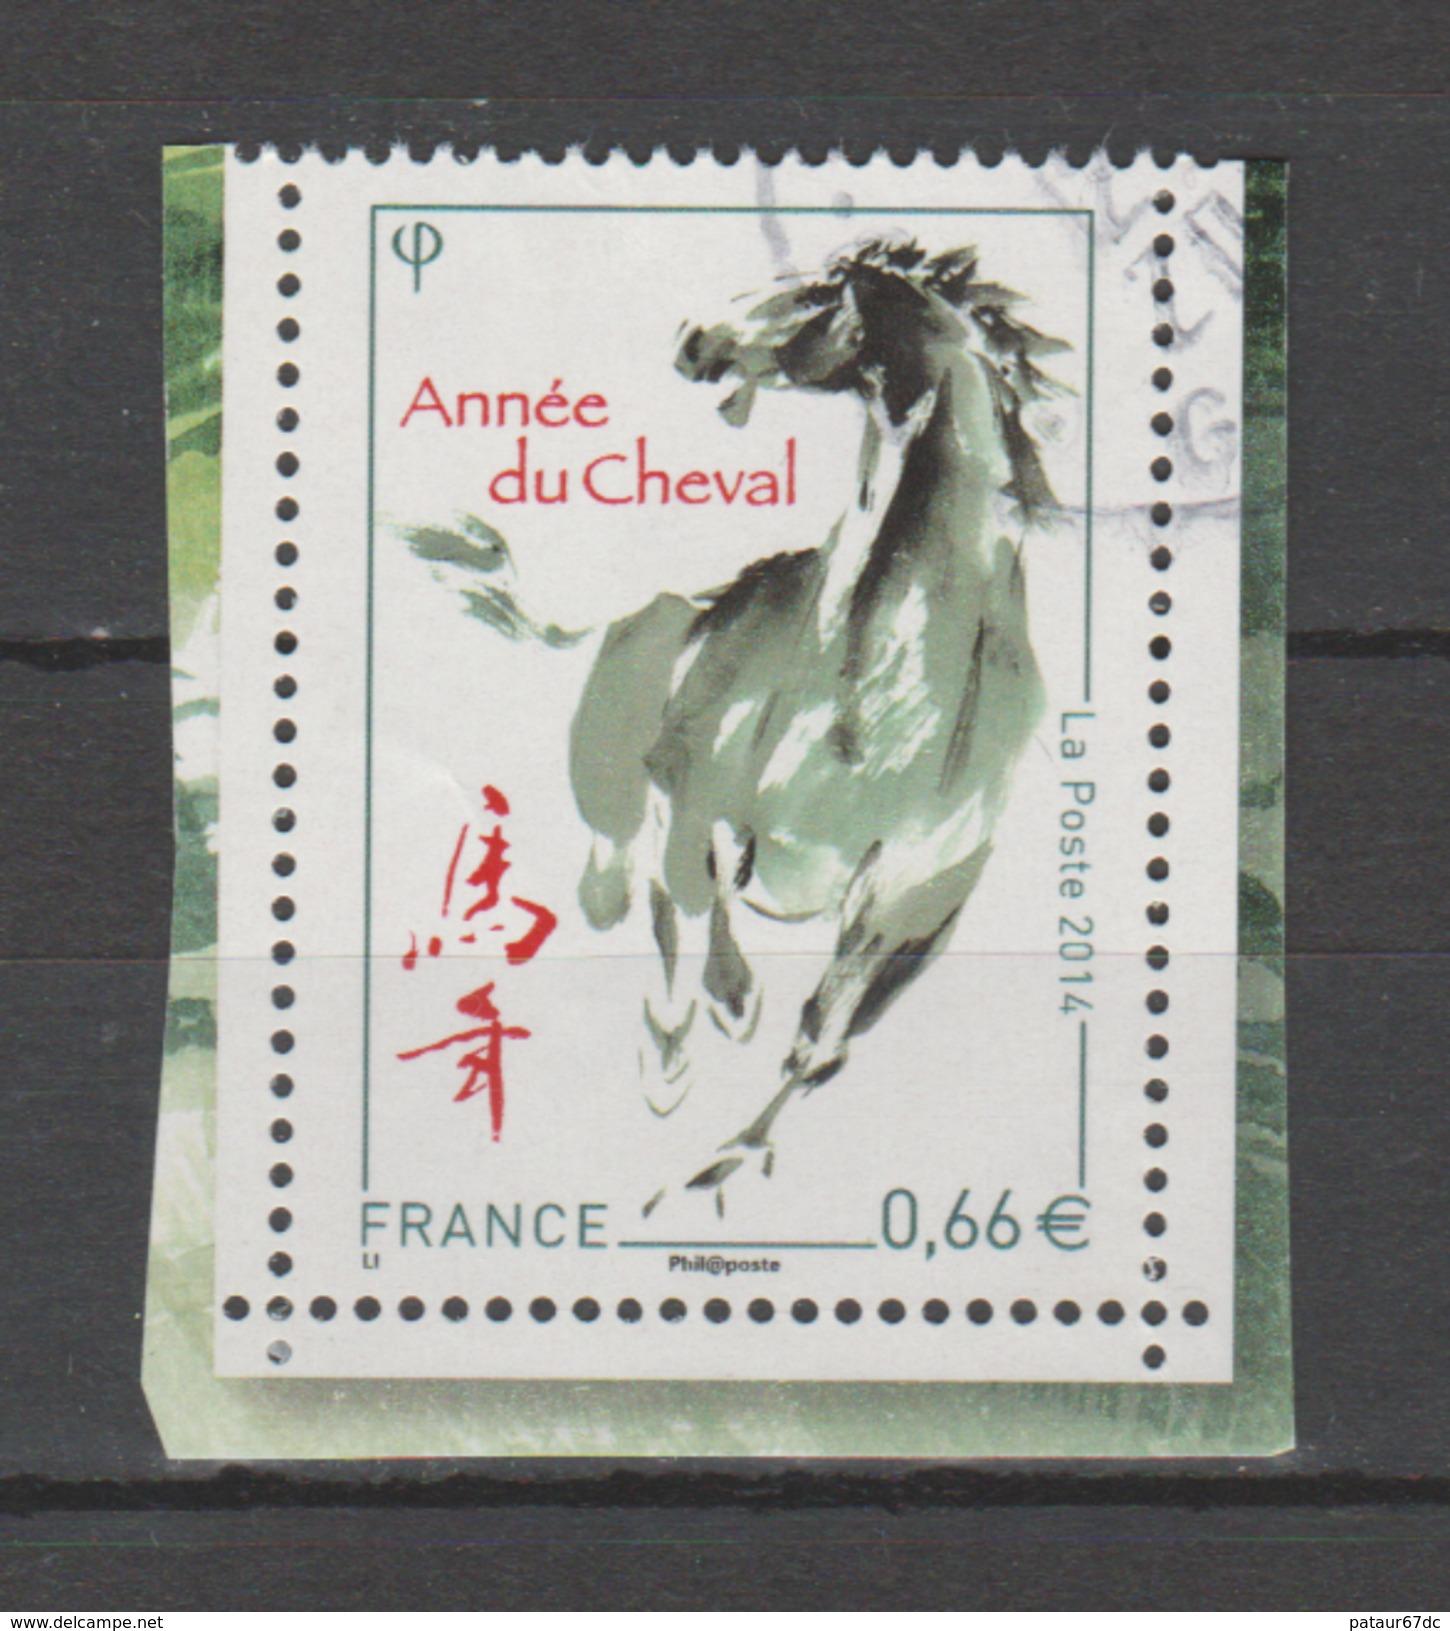 FRANCE / 2014 / Y&T N° 4835 : Année Du Cheval - Choisi - Cachet Rond - France